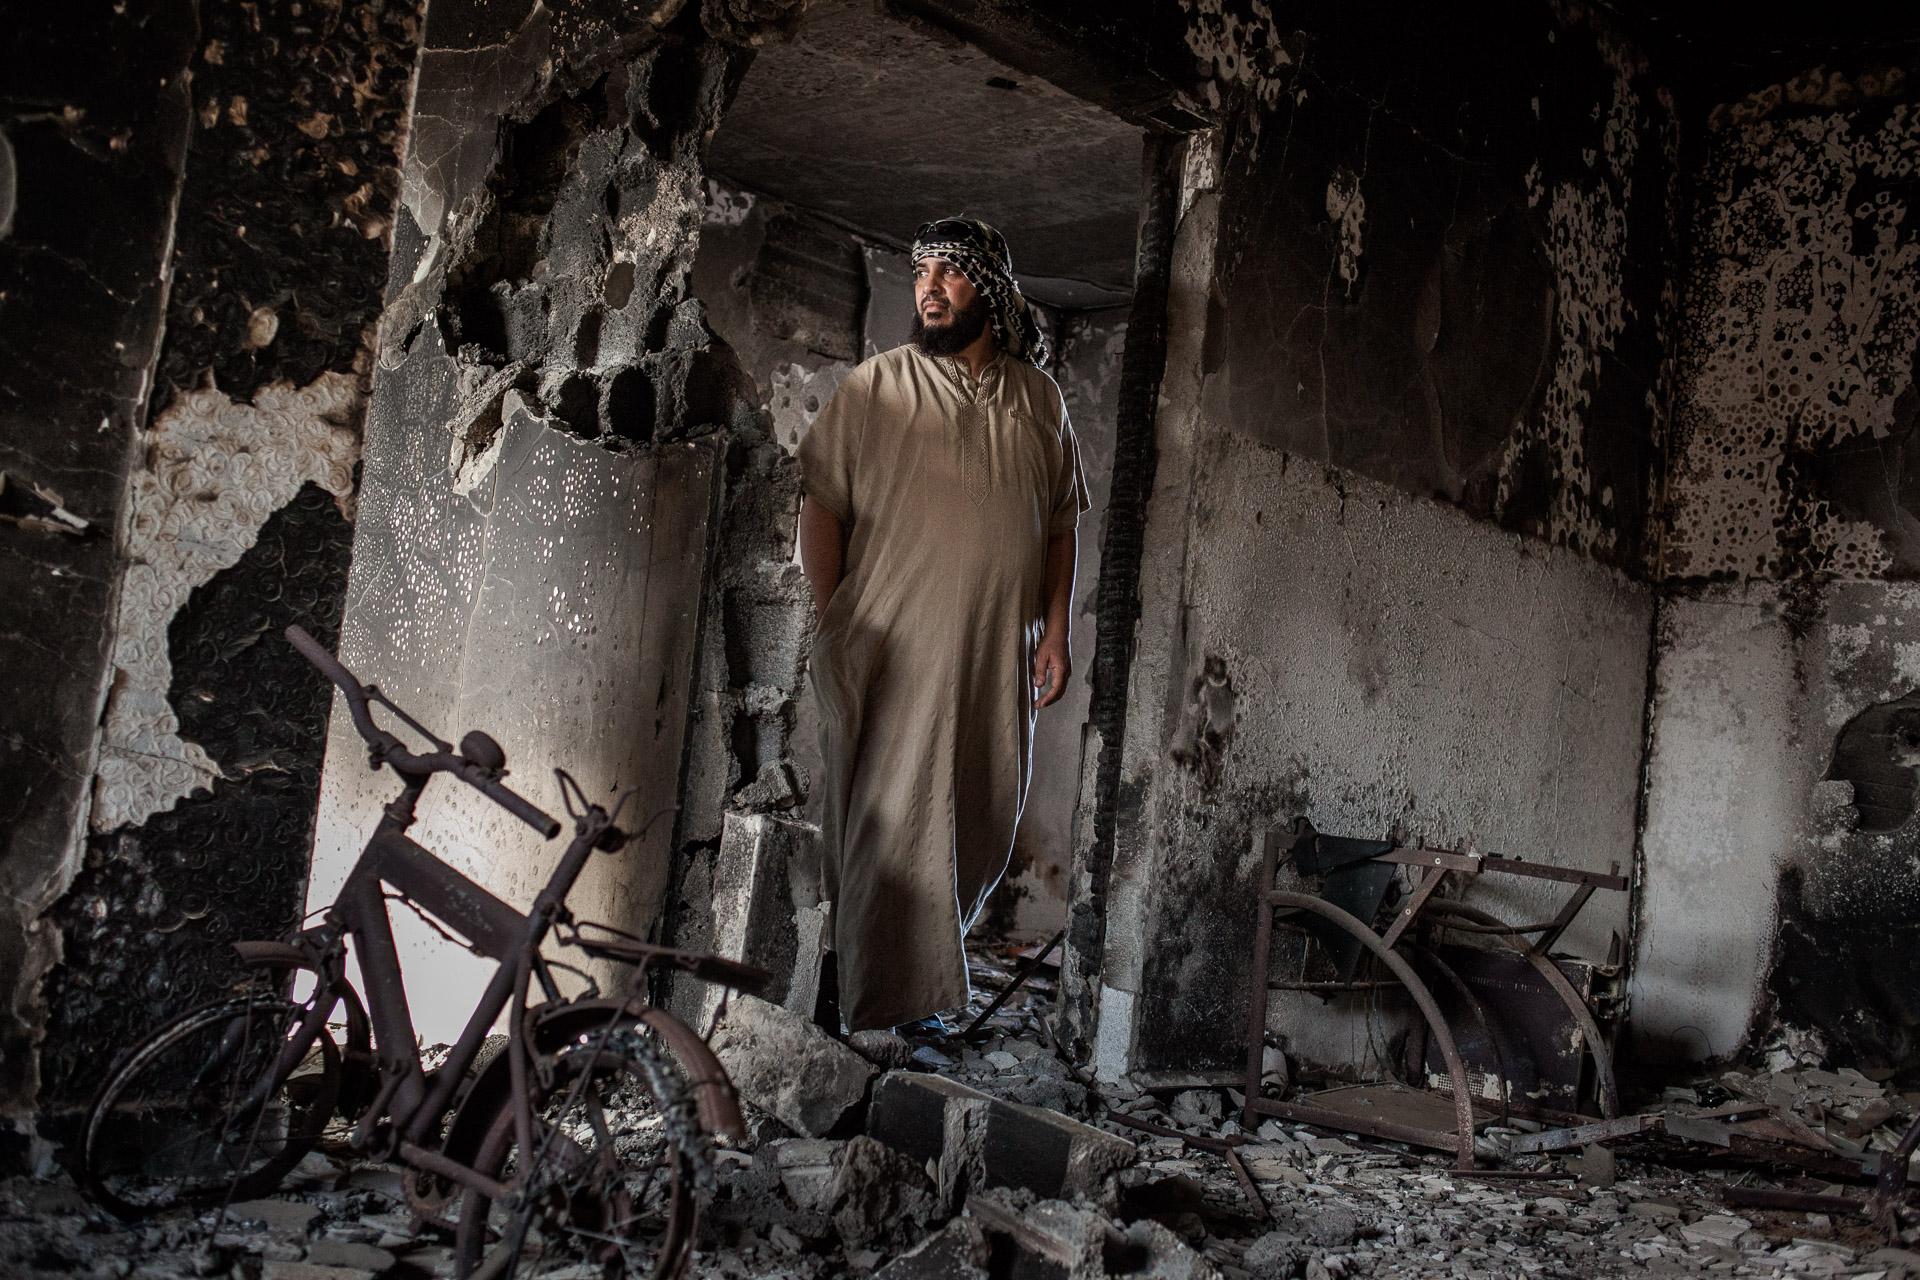 Syrte, Juillet 2012. Walid, dans les décombres de sa maison. Syrte est la ville du pays qui a subi le plus de dommages lors du conflit lybien.Sirte in July 2012. Walid, in the ruins of his house. Sirte is the town of country that has suffered the most damage during the  Libyan conflict.